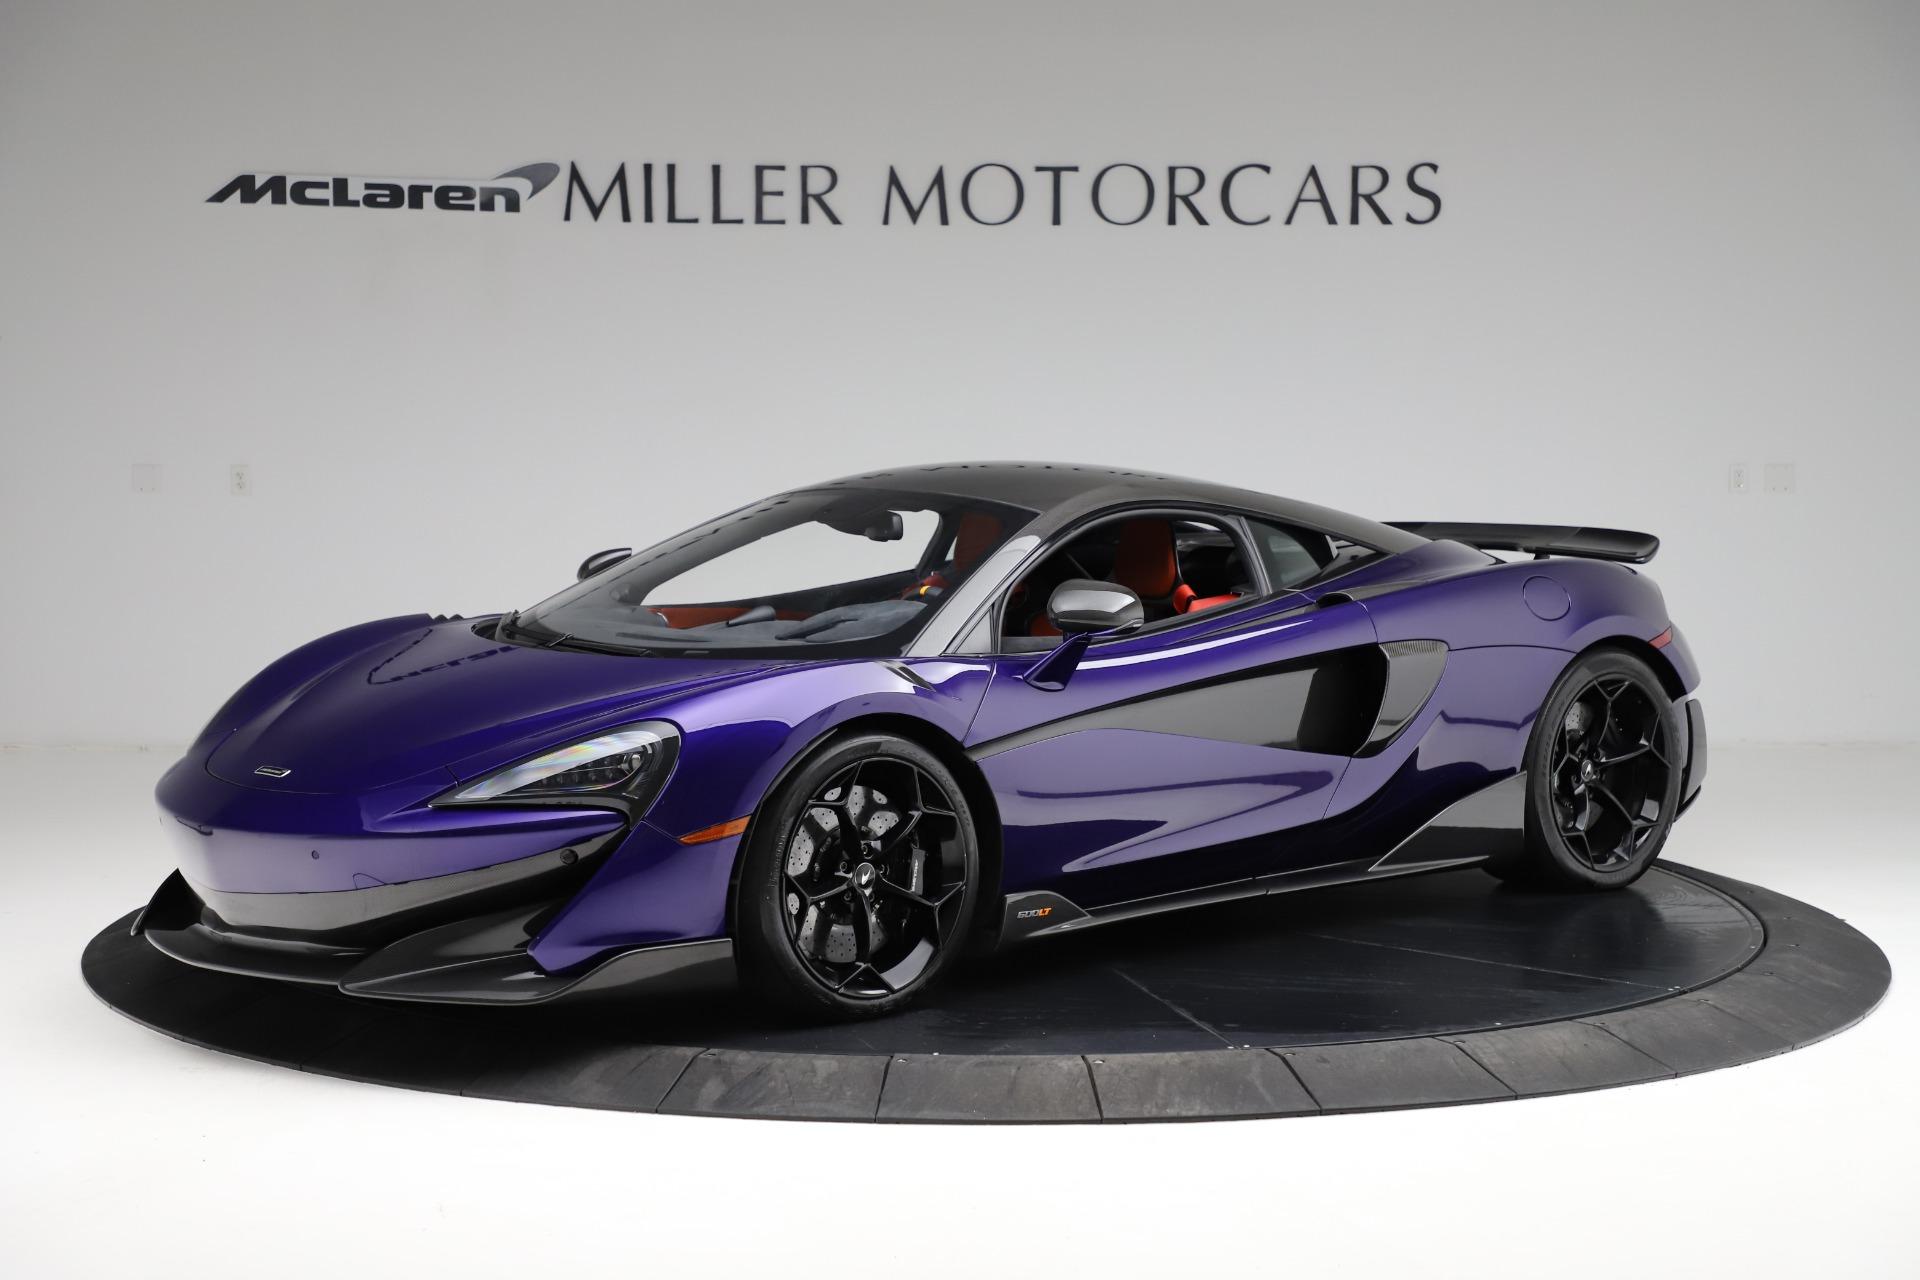 Used 2019 McLaren 600LT for sale $234,900 at Alfa Romeo of Westport in Westport CT 06880 1